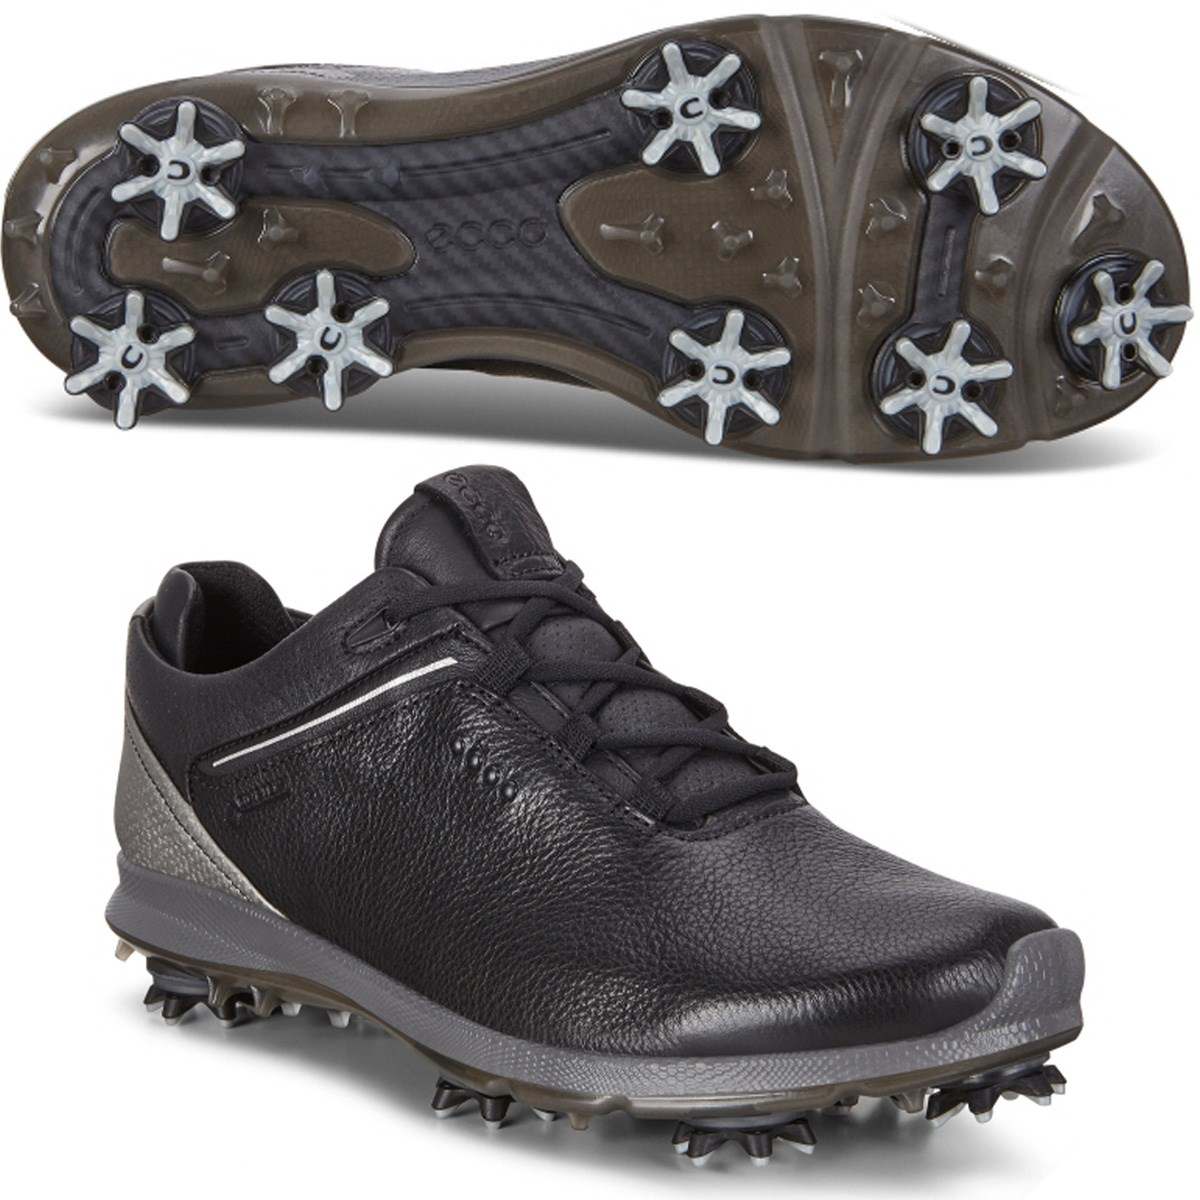 ecco エコー ゴルフ バイオム G2 2.0 GTX シューズ 25cm/EUサイズ40 ブラック レディス